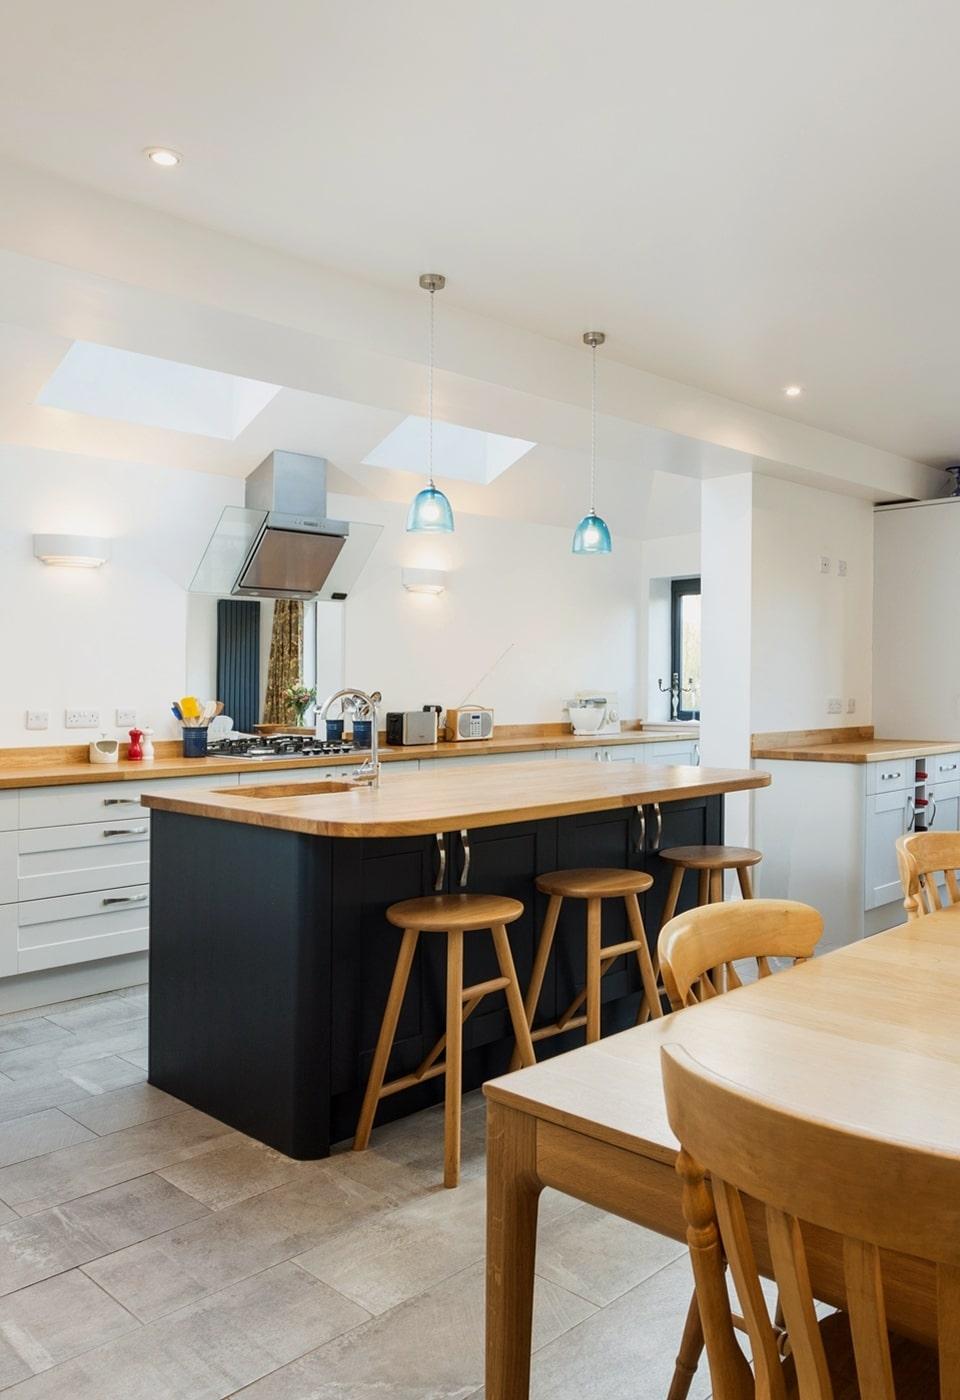 Restoration of Flood Damaged Property – York